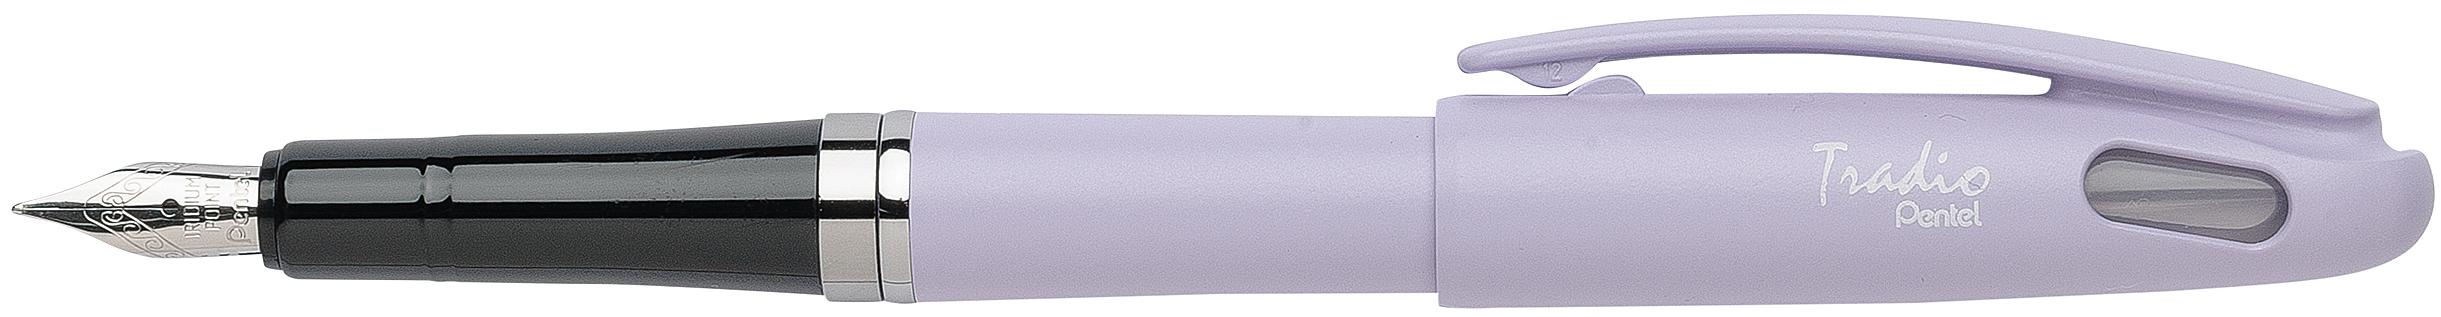 Pentel Tradio Pastel - Stylo plume - corps violet